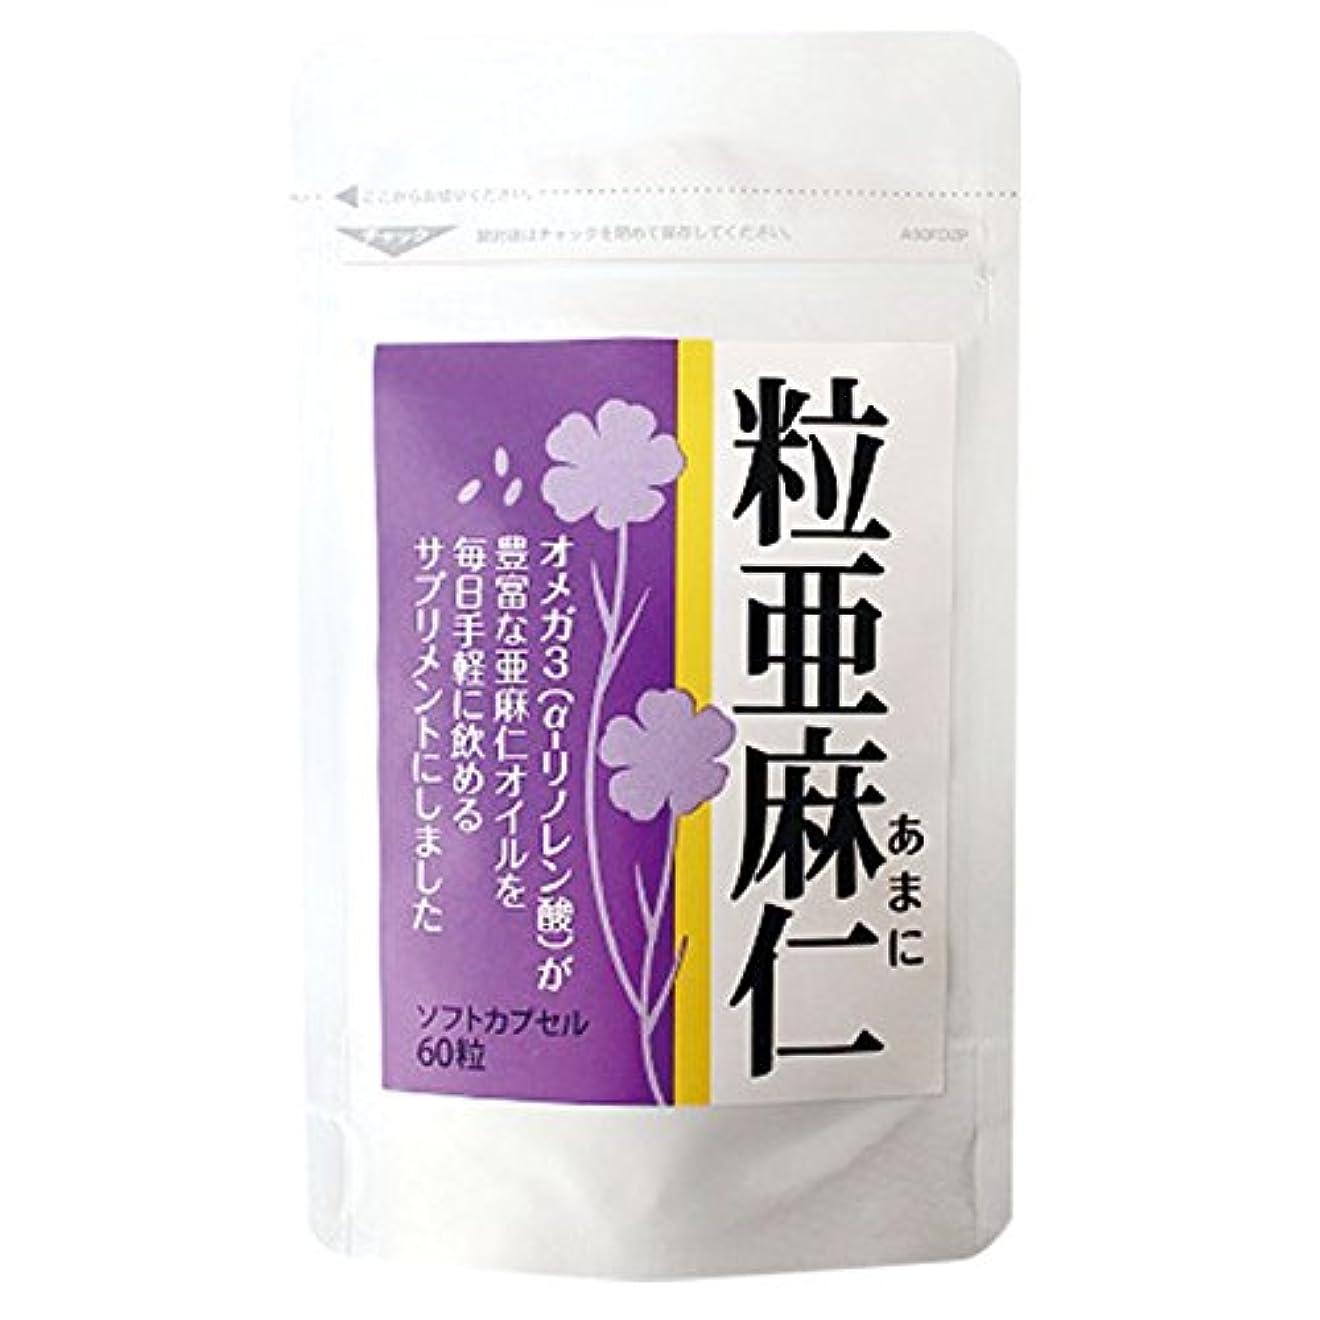 回想カリング化学薬品粒亜麻仁(60粒)